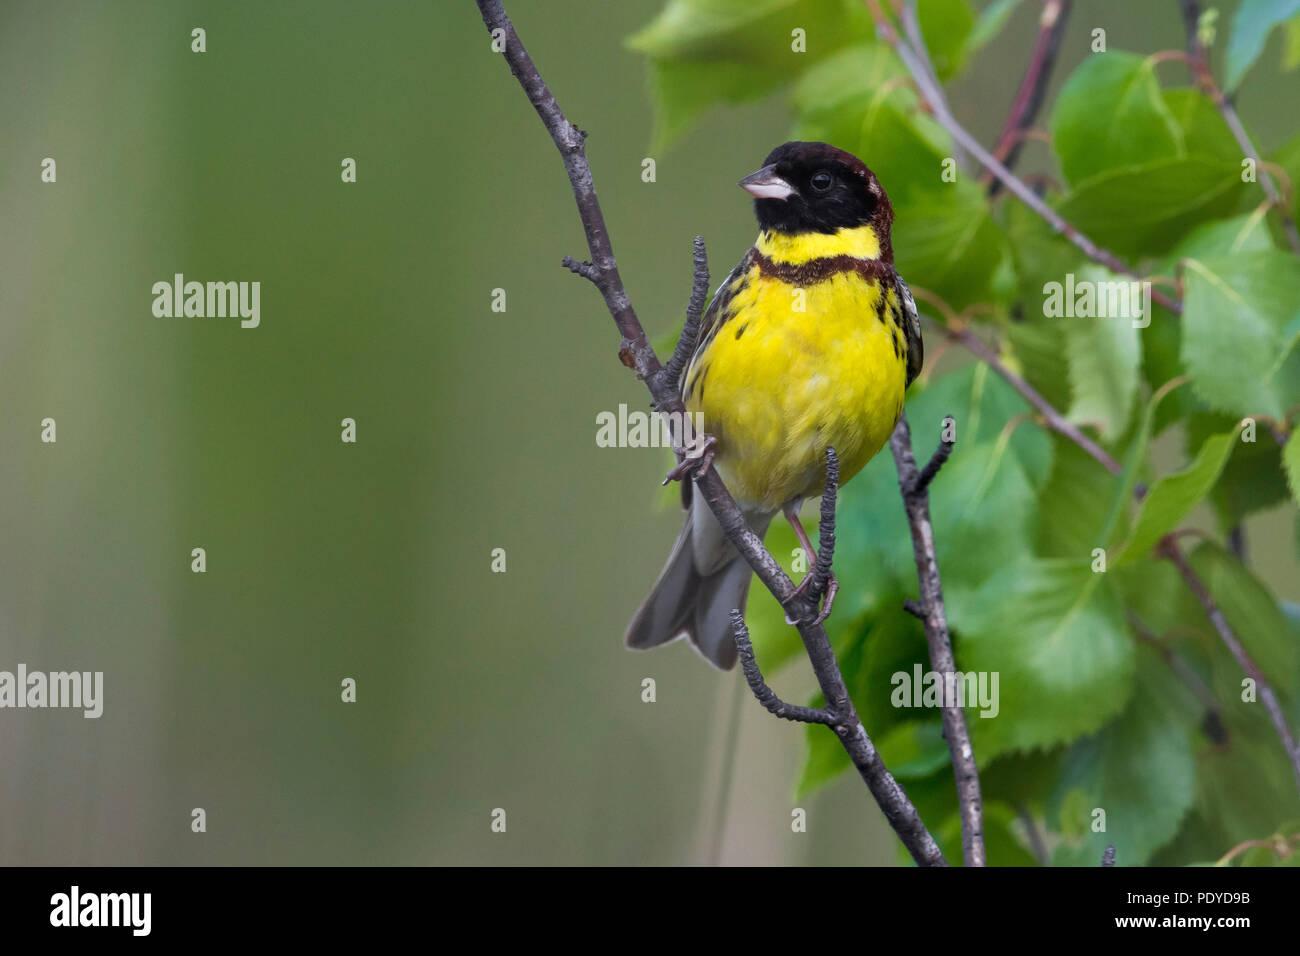 Männliche Yellow-breasted Bunting; Emberiza aureola Stockbild